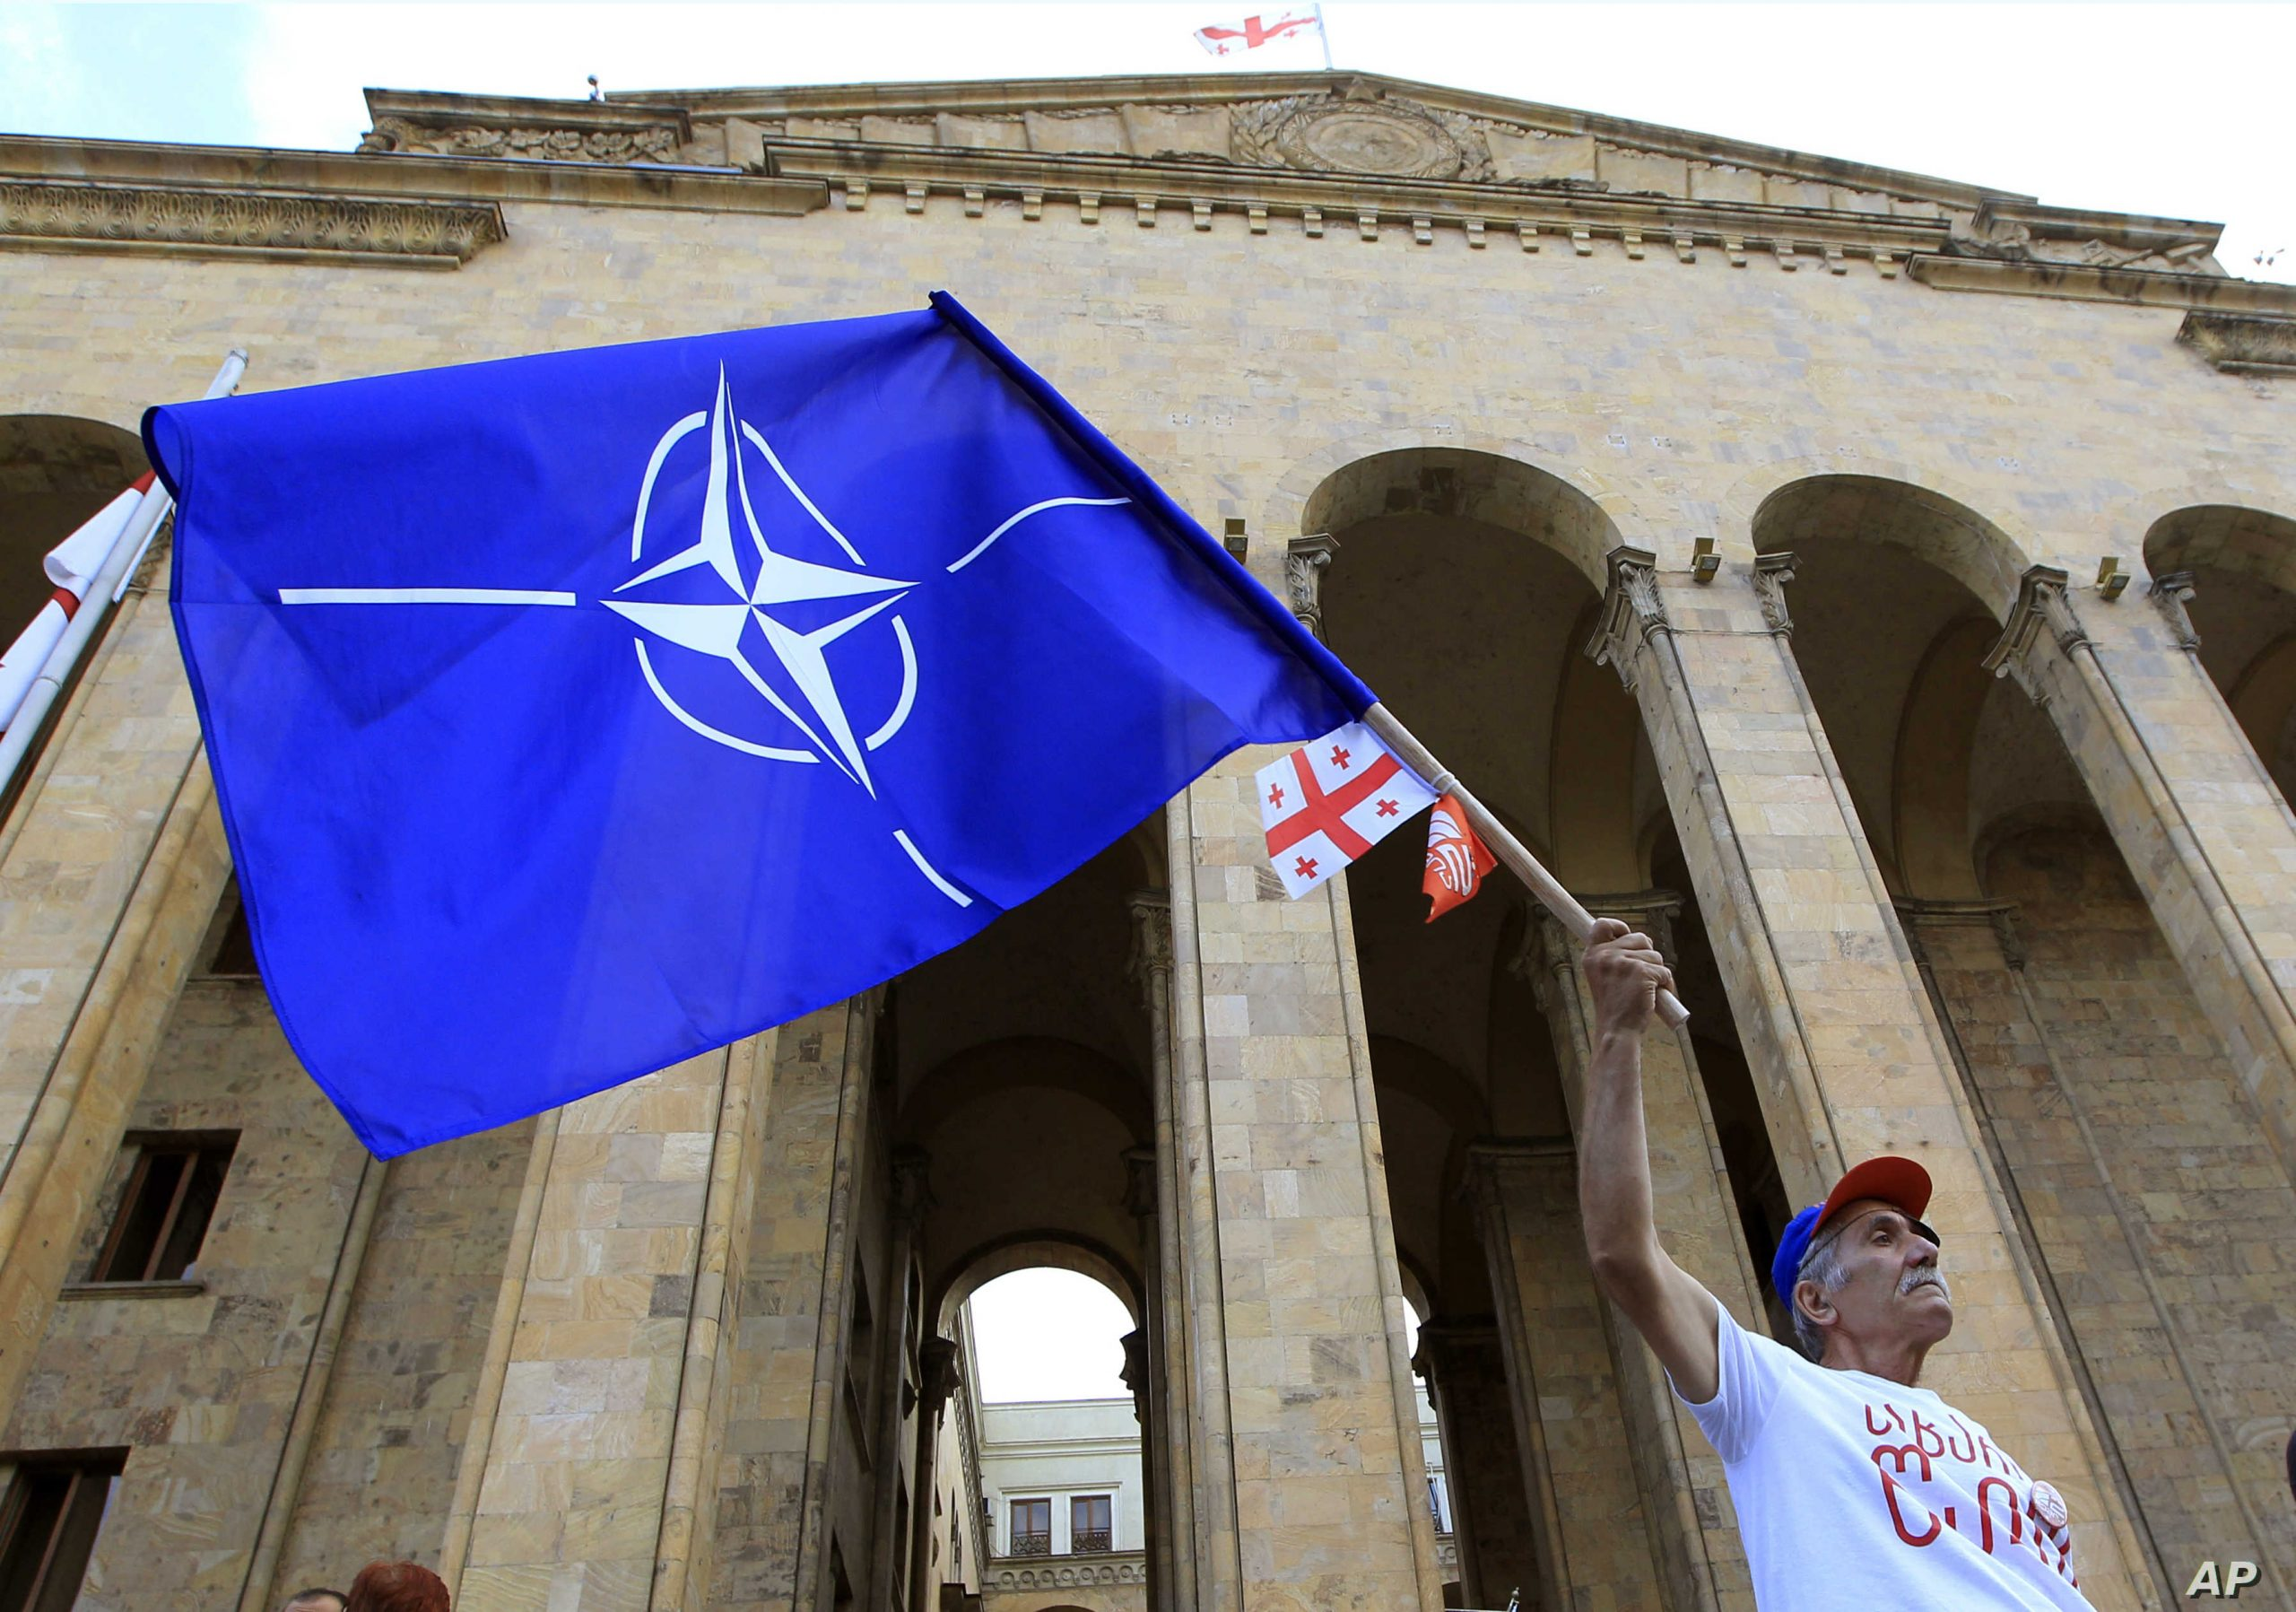 ap georgia nato scaled #новости Грузия-НАТО, парламент Грузии, Североатлантитческий альянс